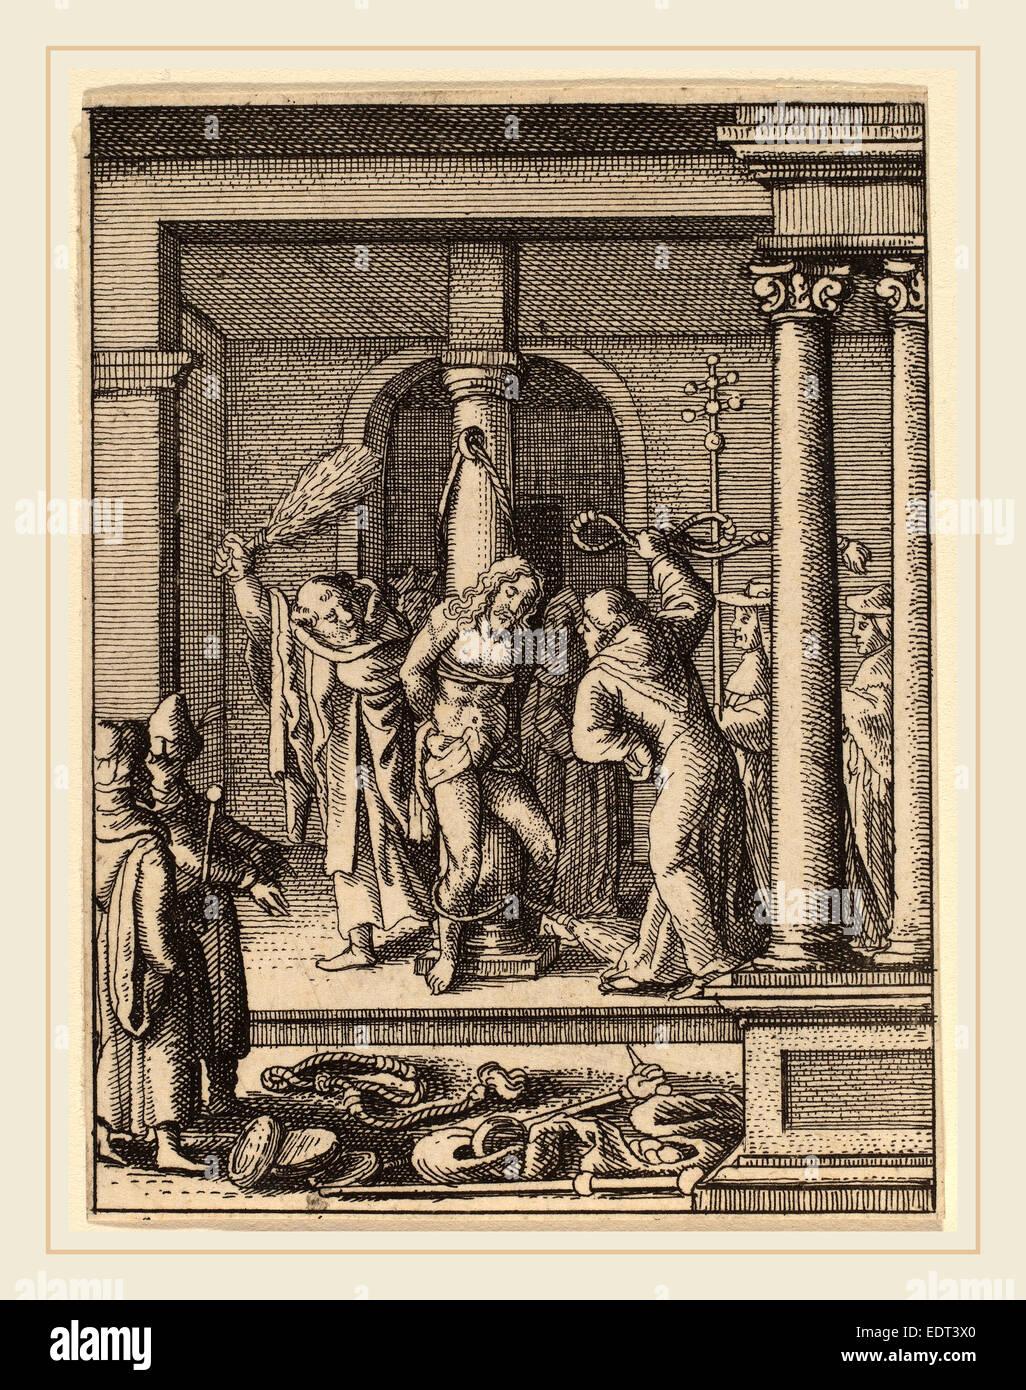 Wenceslaus Hollar (Bohemian, 1607-1677), The Scourging, etching - Stock Image